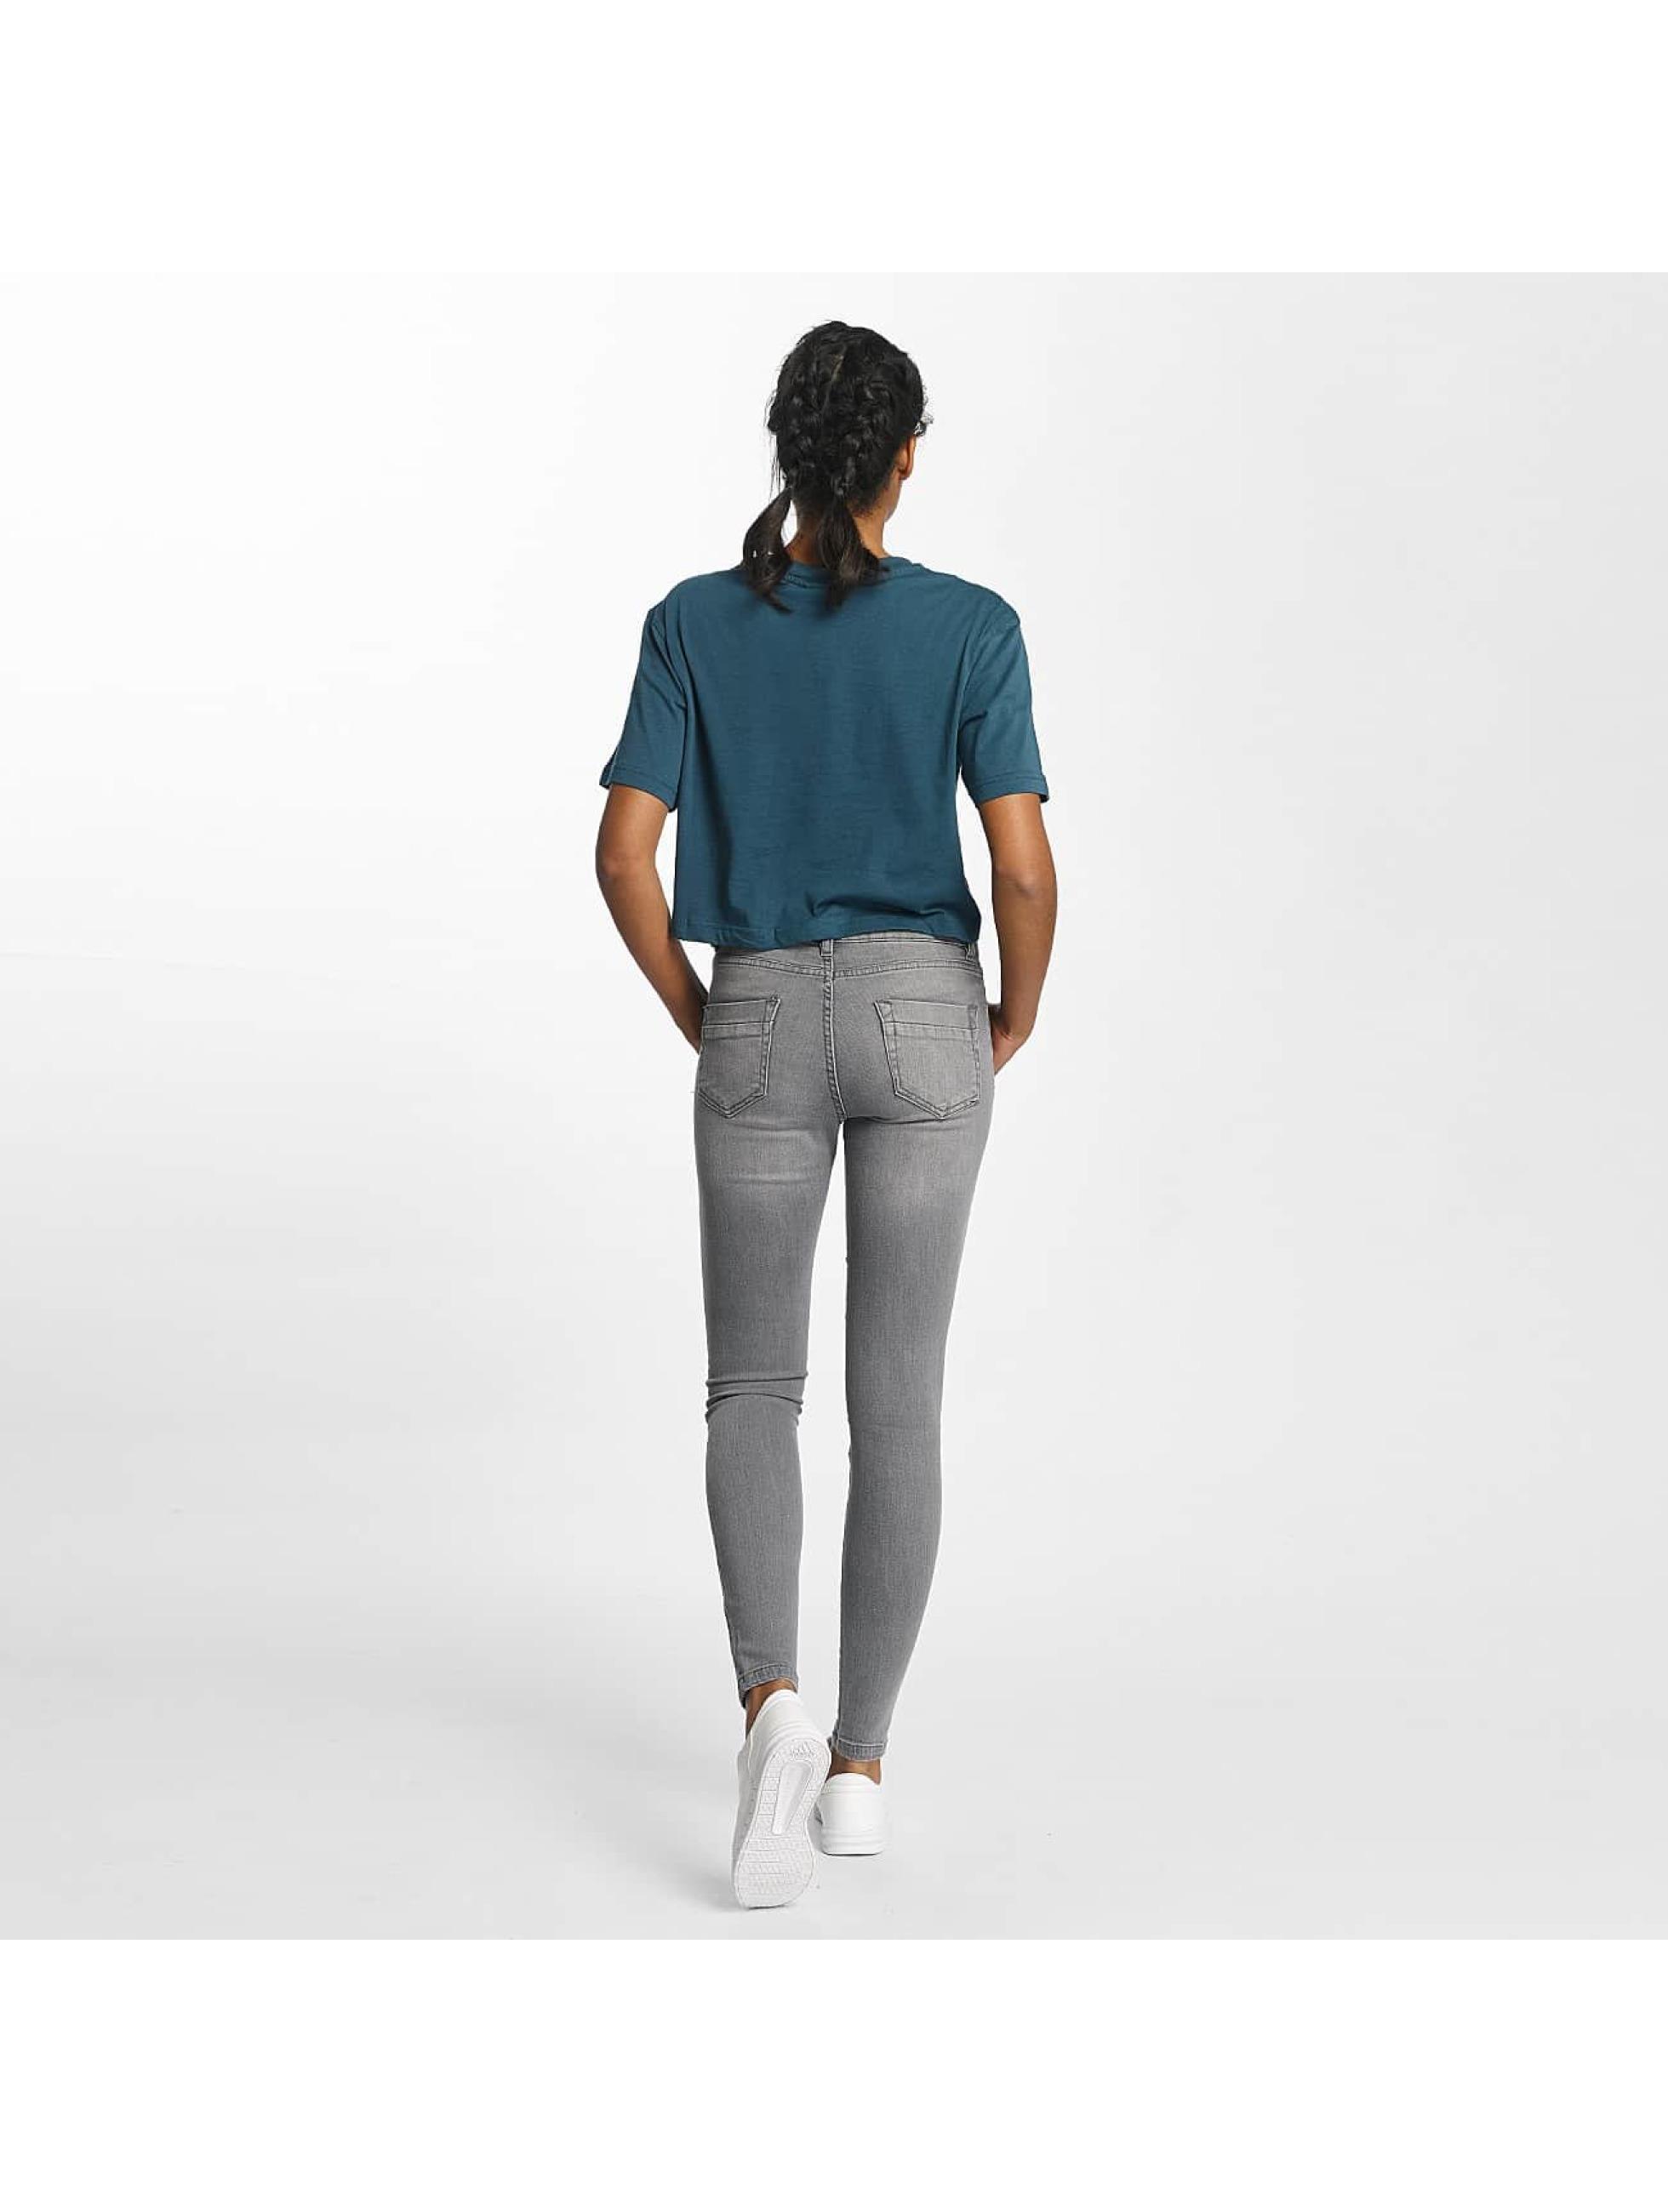 Urban Classics T-Shirt Ladies Oversized türkis